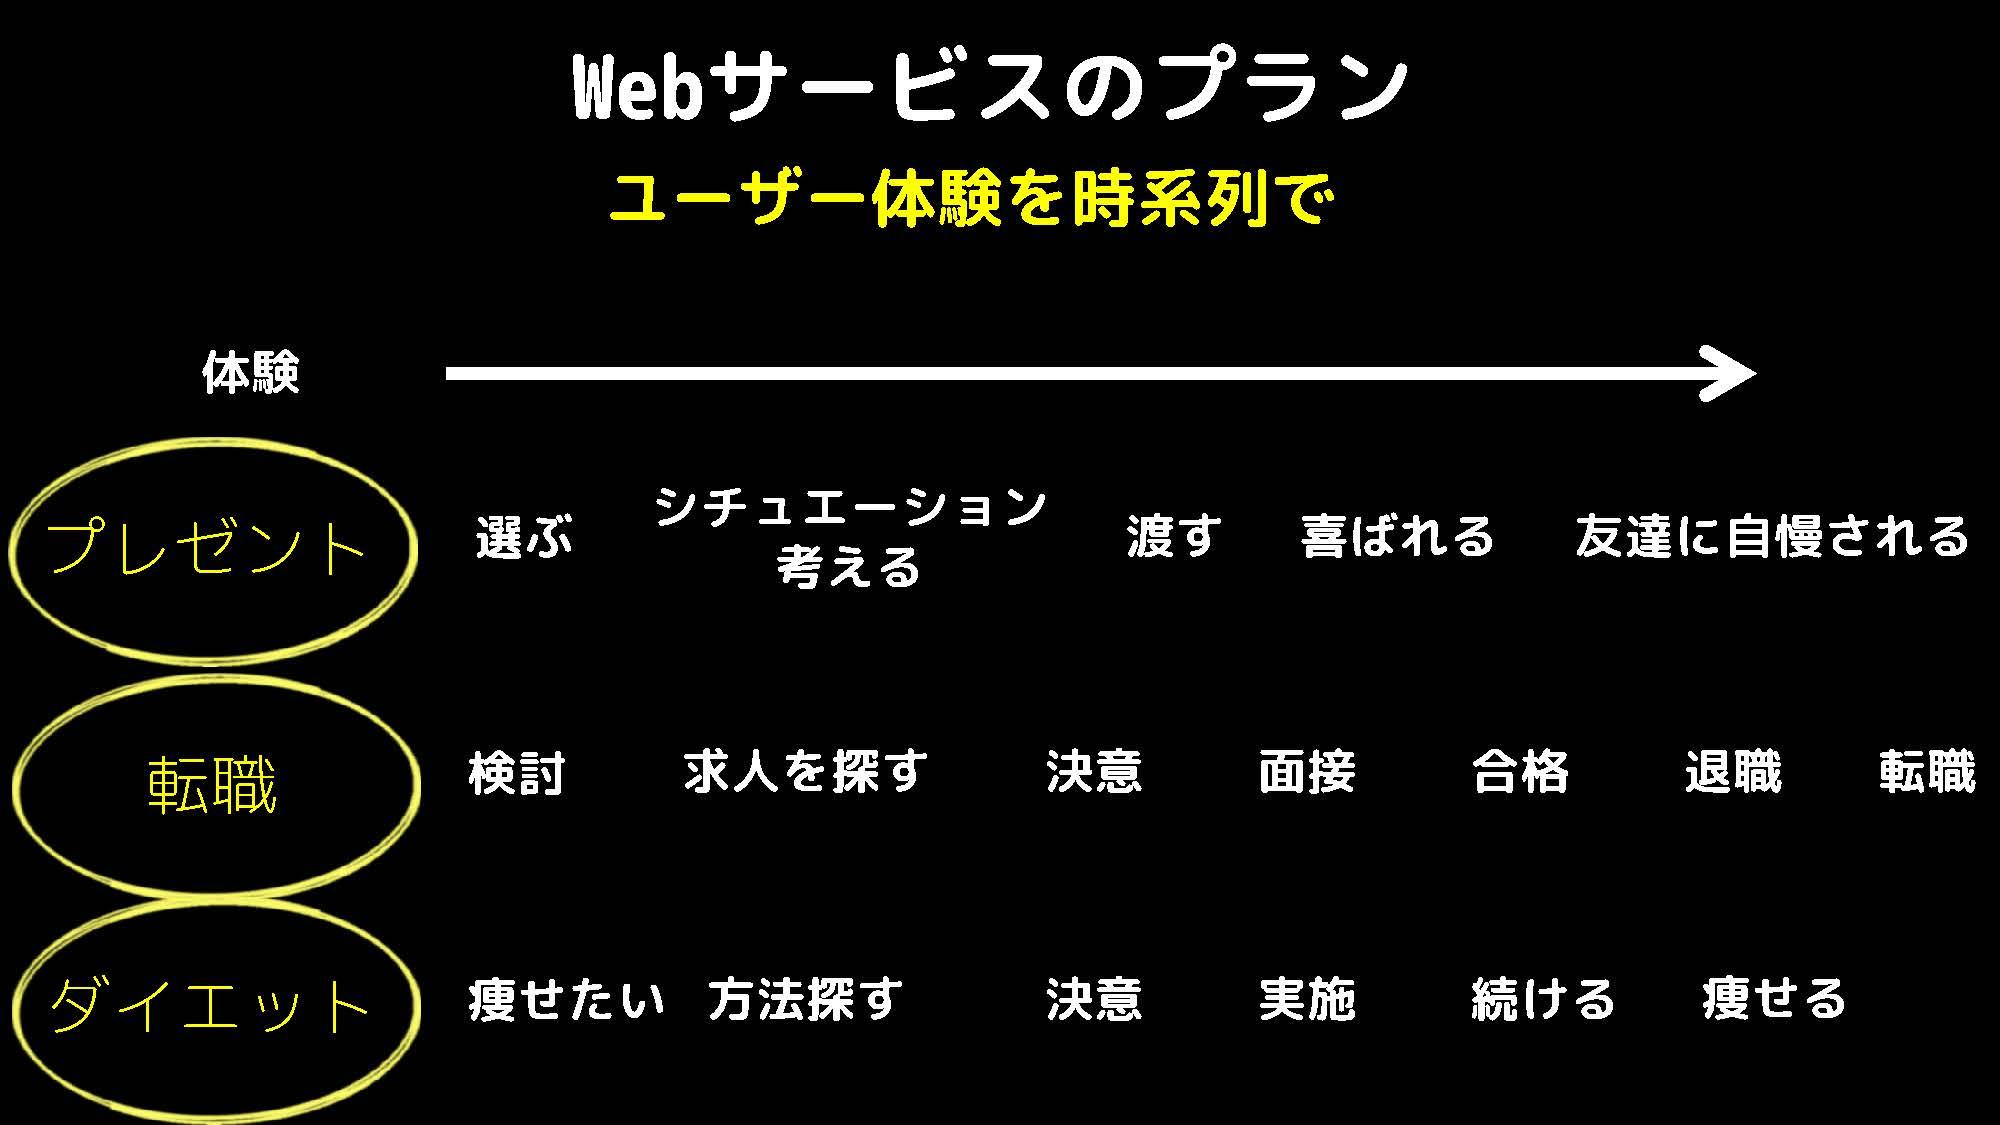 web-160911152159_%e3%83%9a%e3%83%bc%e3%82%b8_19